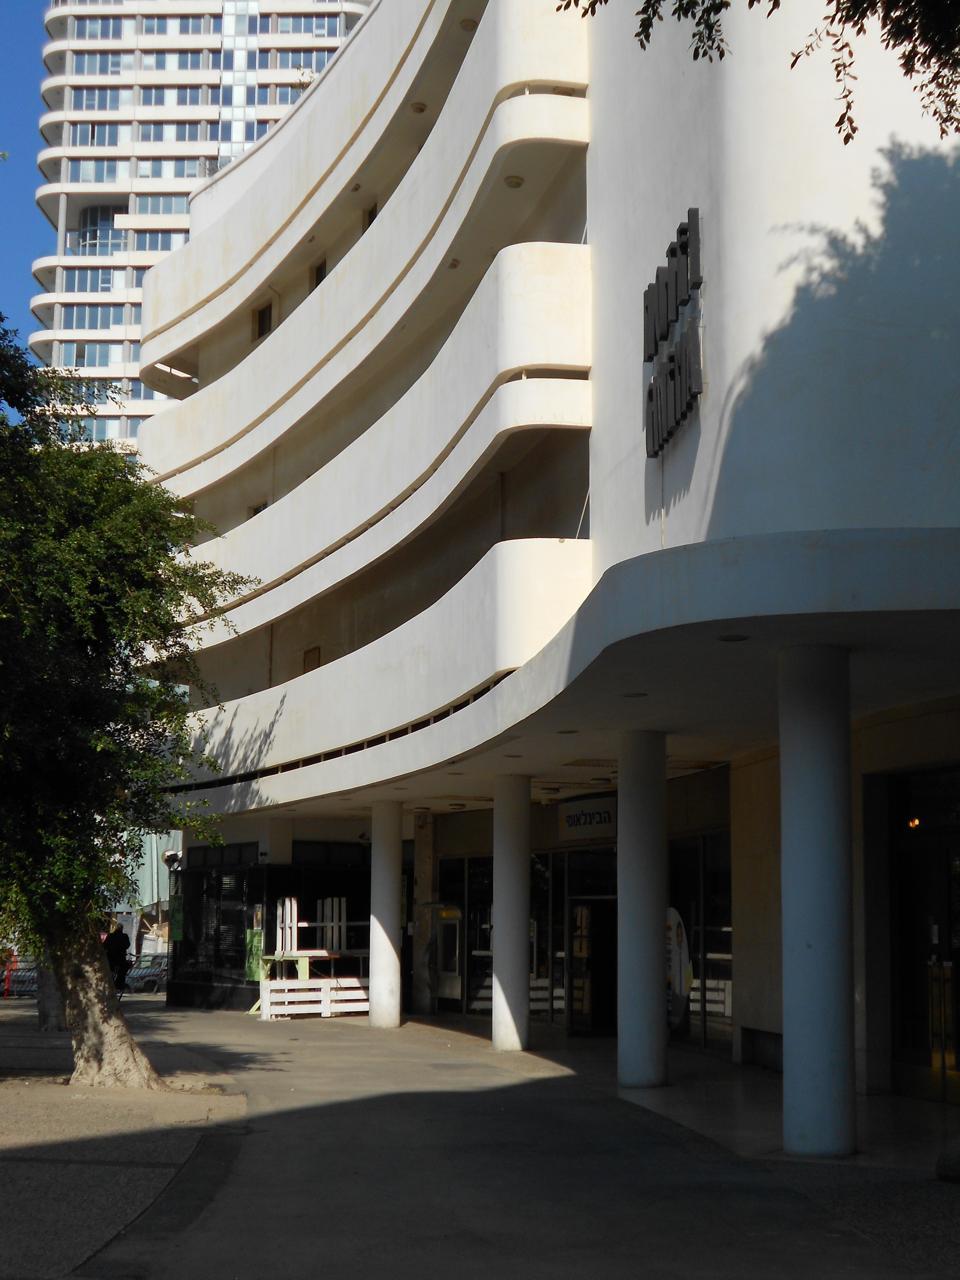 Bauhaus architecture Tel Aviv White City.